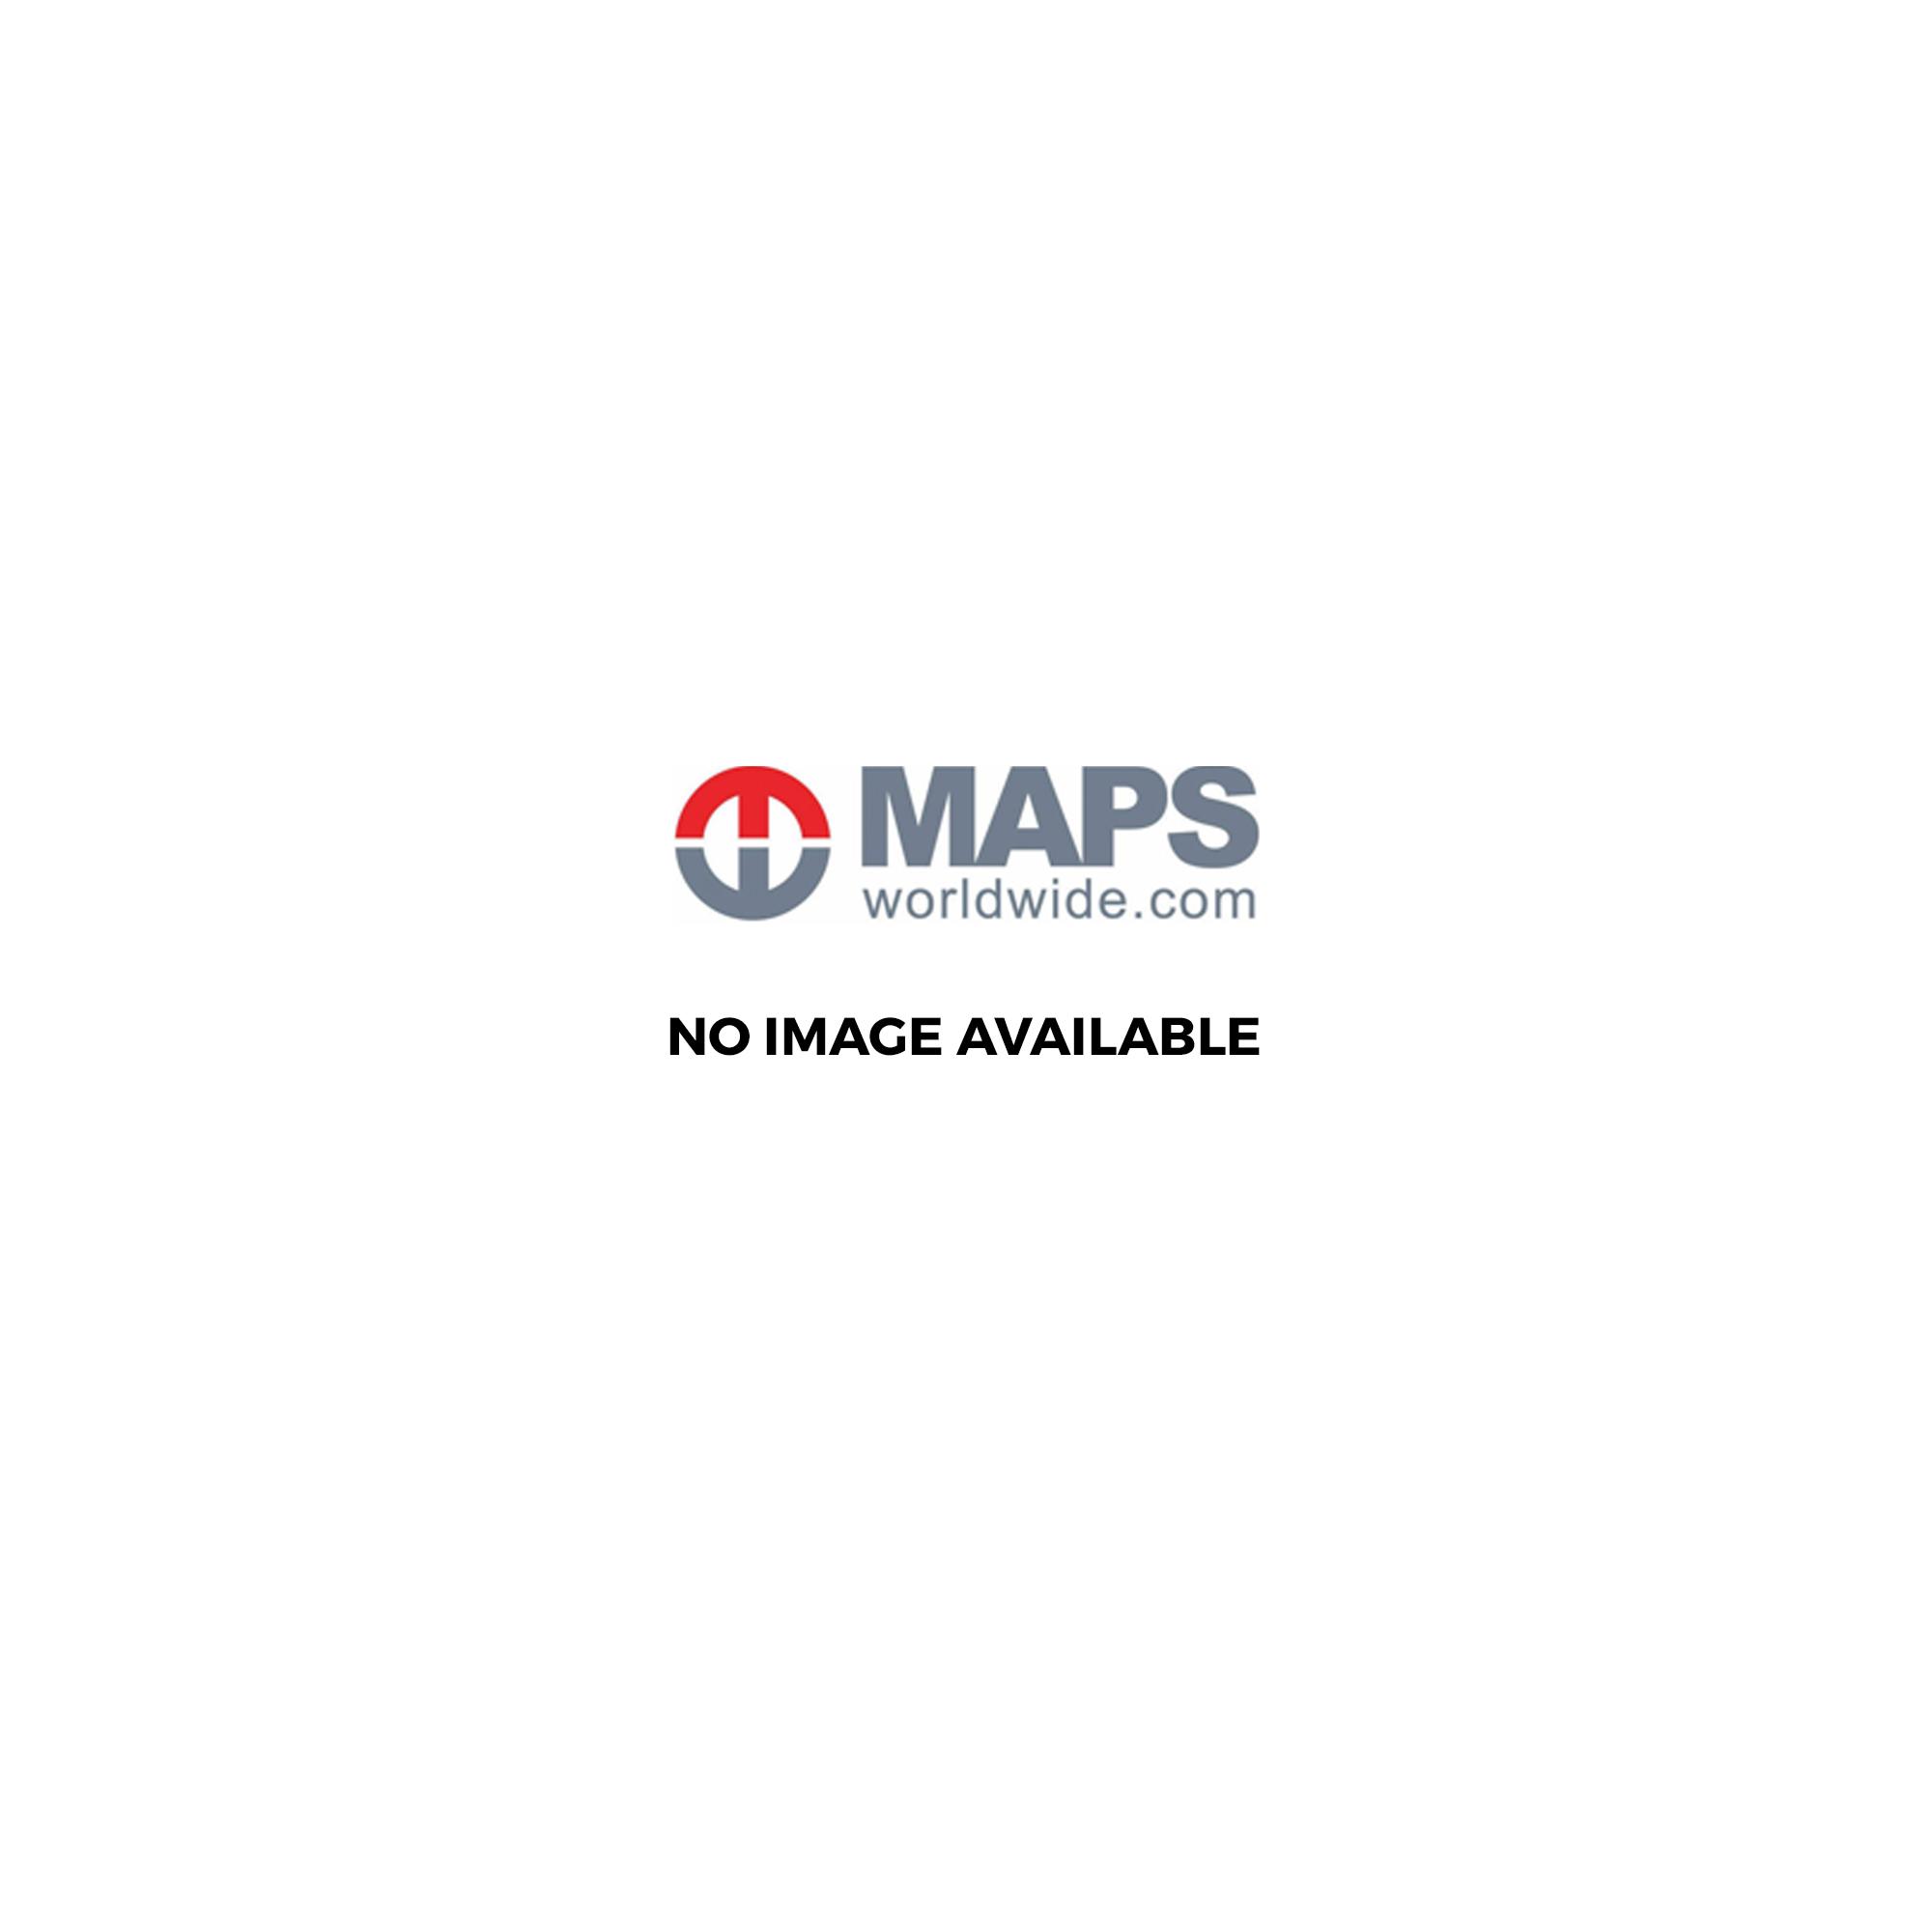 Garmisch Partenkirchen Map on babenhausen map, cortina d'ampezzo map, magdeburg map, berchtesgaden map, landstuhl map, germany map, weimar map, freiburg map, albertville map, rothenburg ob der tauber map, karlsruhe map, europe map, bonn map, garmisch trail map, saxony map, koblenz map, dortmund map, oberammergau map, oslo map, duisburg map,